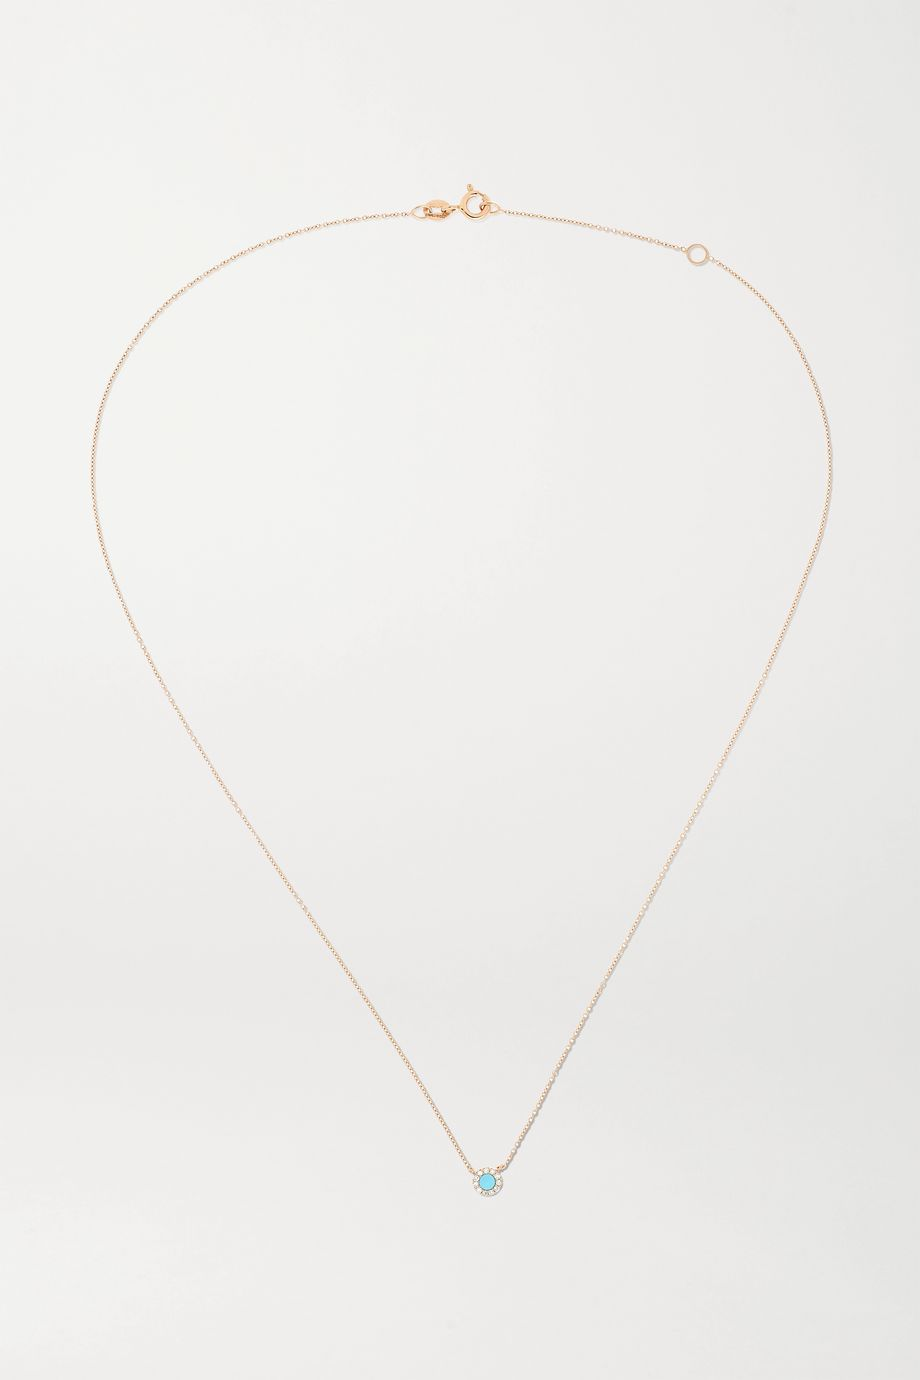 Diane Kordas 18K 玫瑰金、绿松石、钻石项链